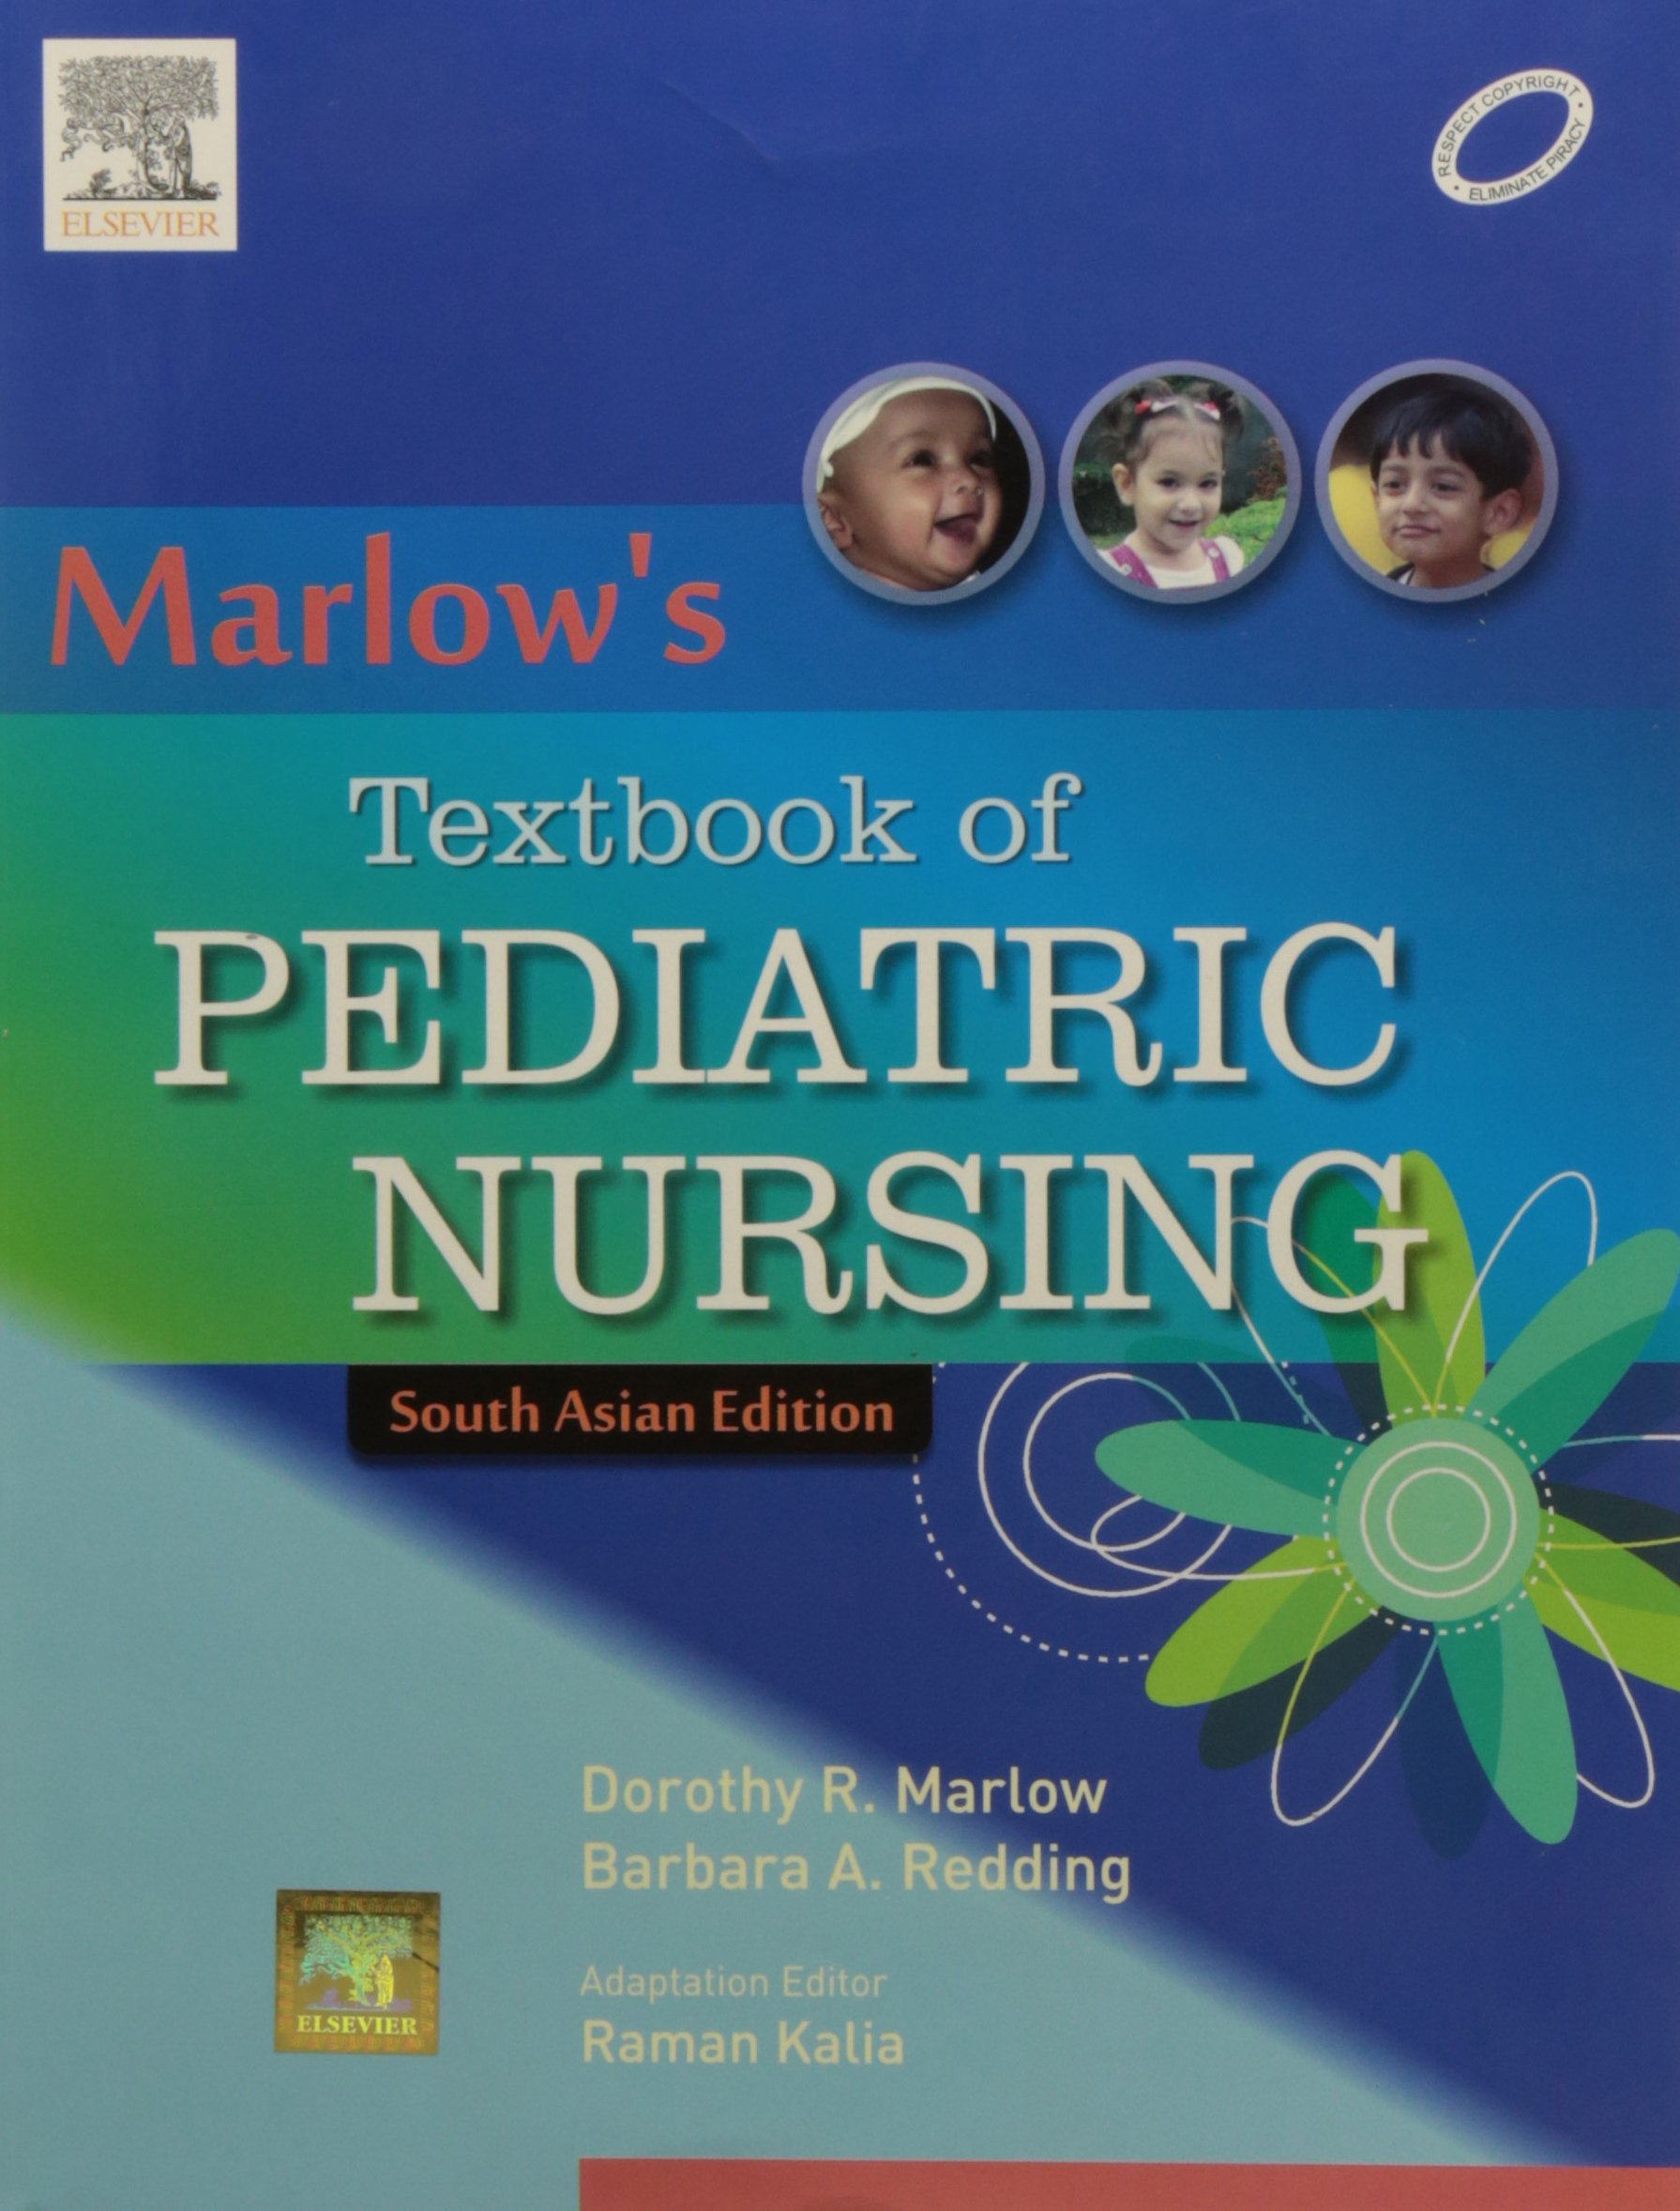 Buy Textbook Of Pediatric Nursing South Asian Edition Adaptation